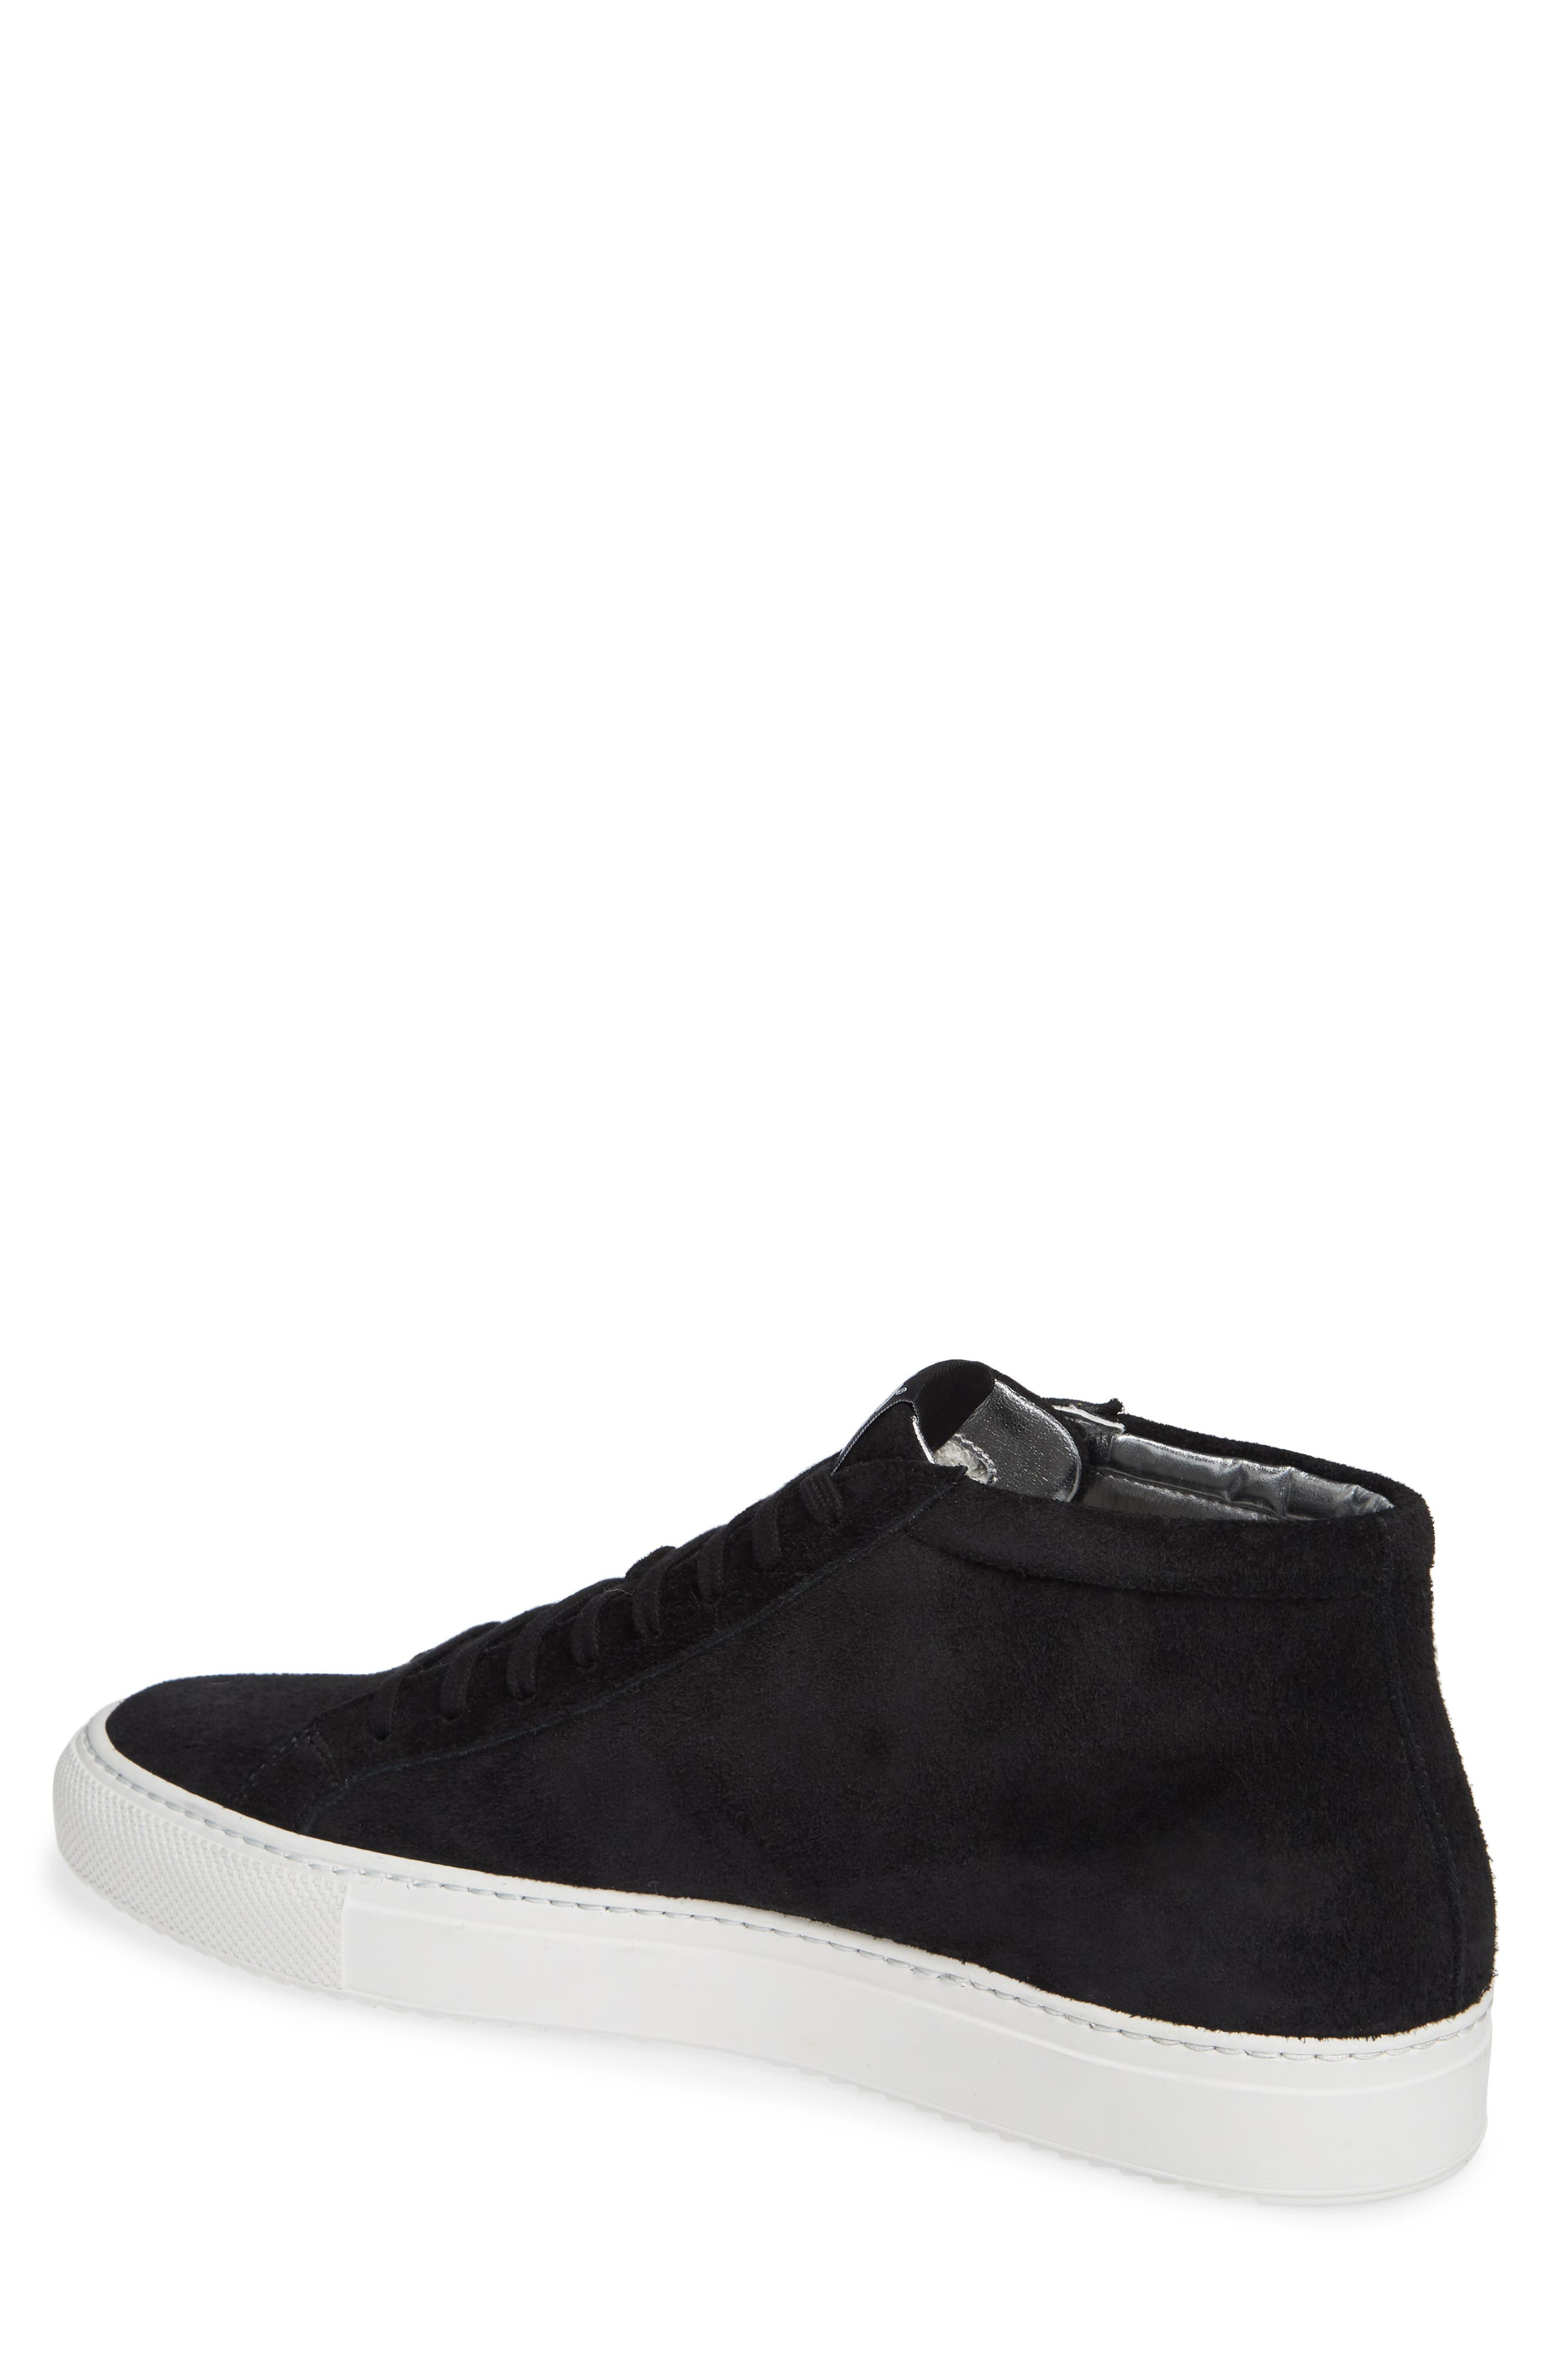 A8Elevent Mid Sneaker,                             Alternate thumbnail 2, color,                             BLACK BRUSH